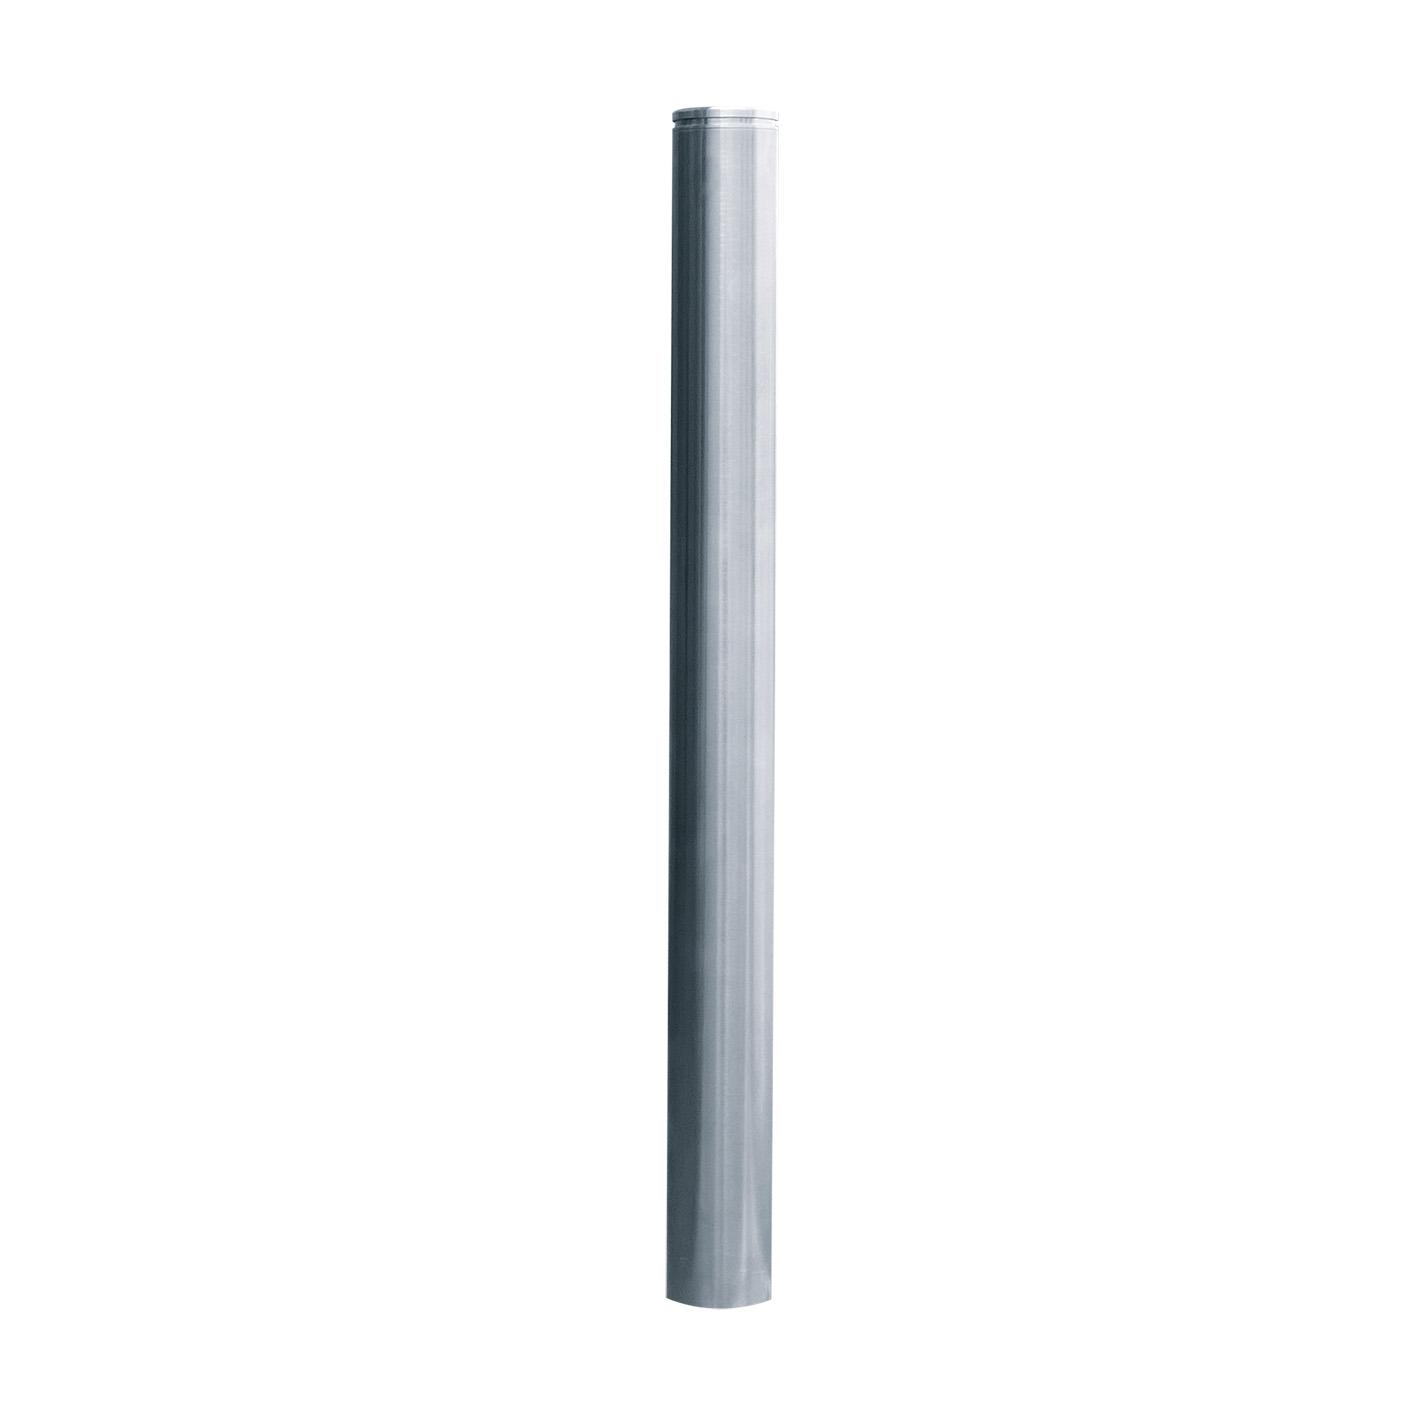 Edelstahlpfosten 4272 |  Ø 76 x 900 mm